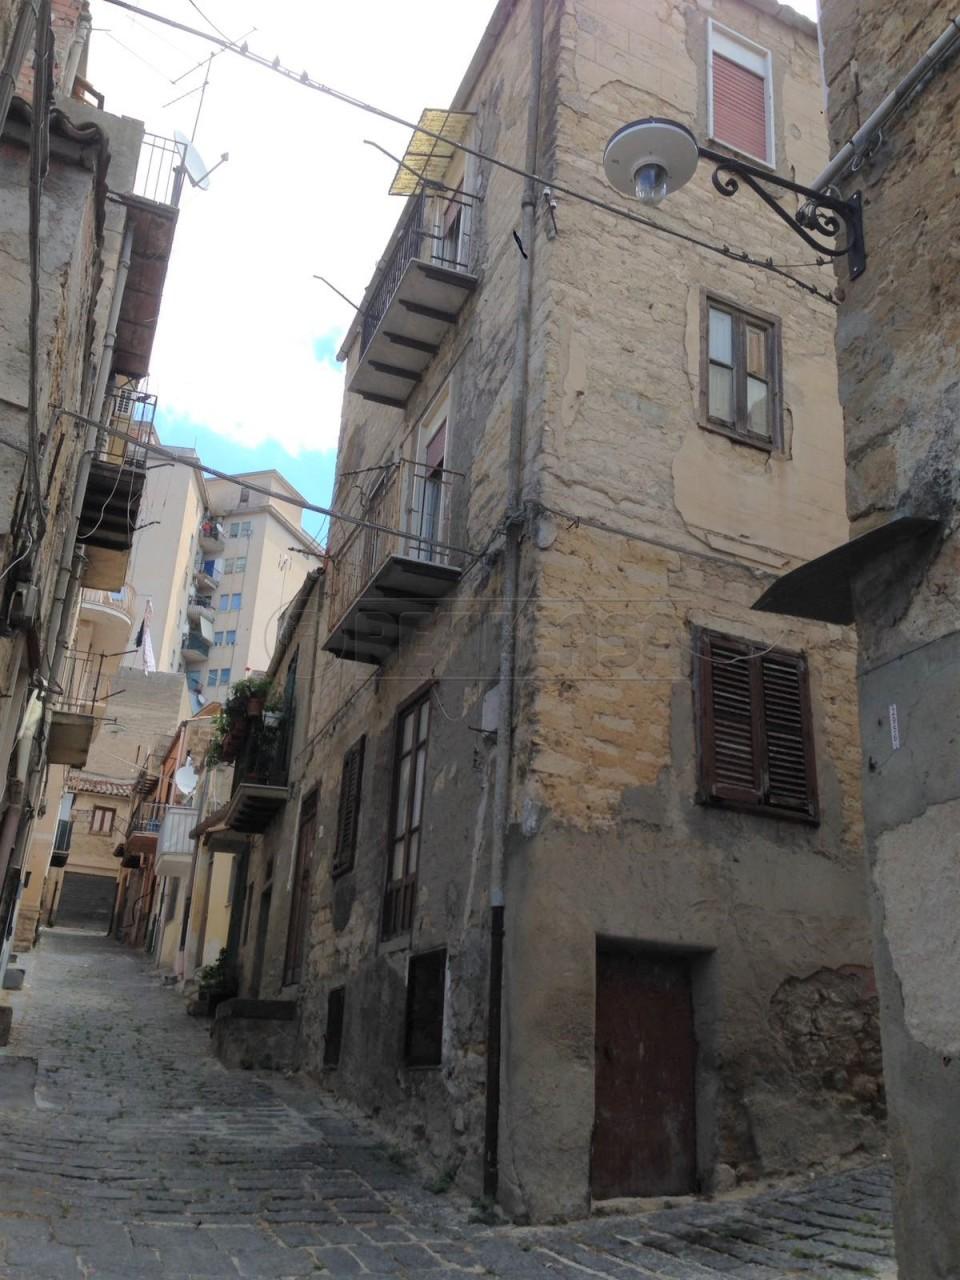 Palazzina / Stabile a CENTRO  STORICO, Caltanissetta